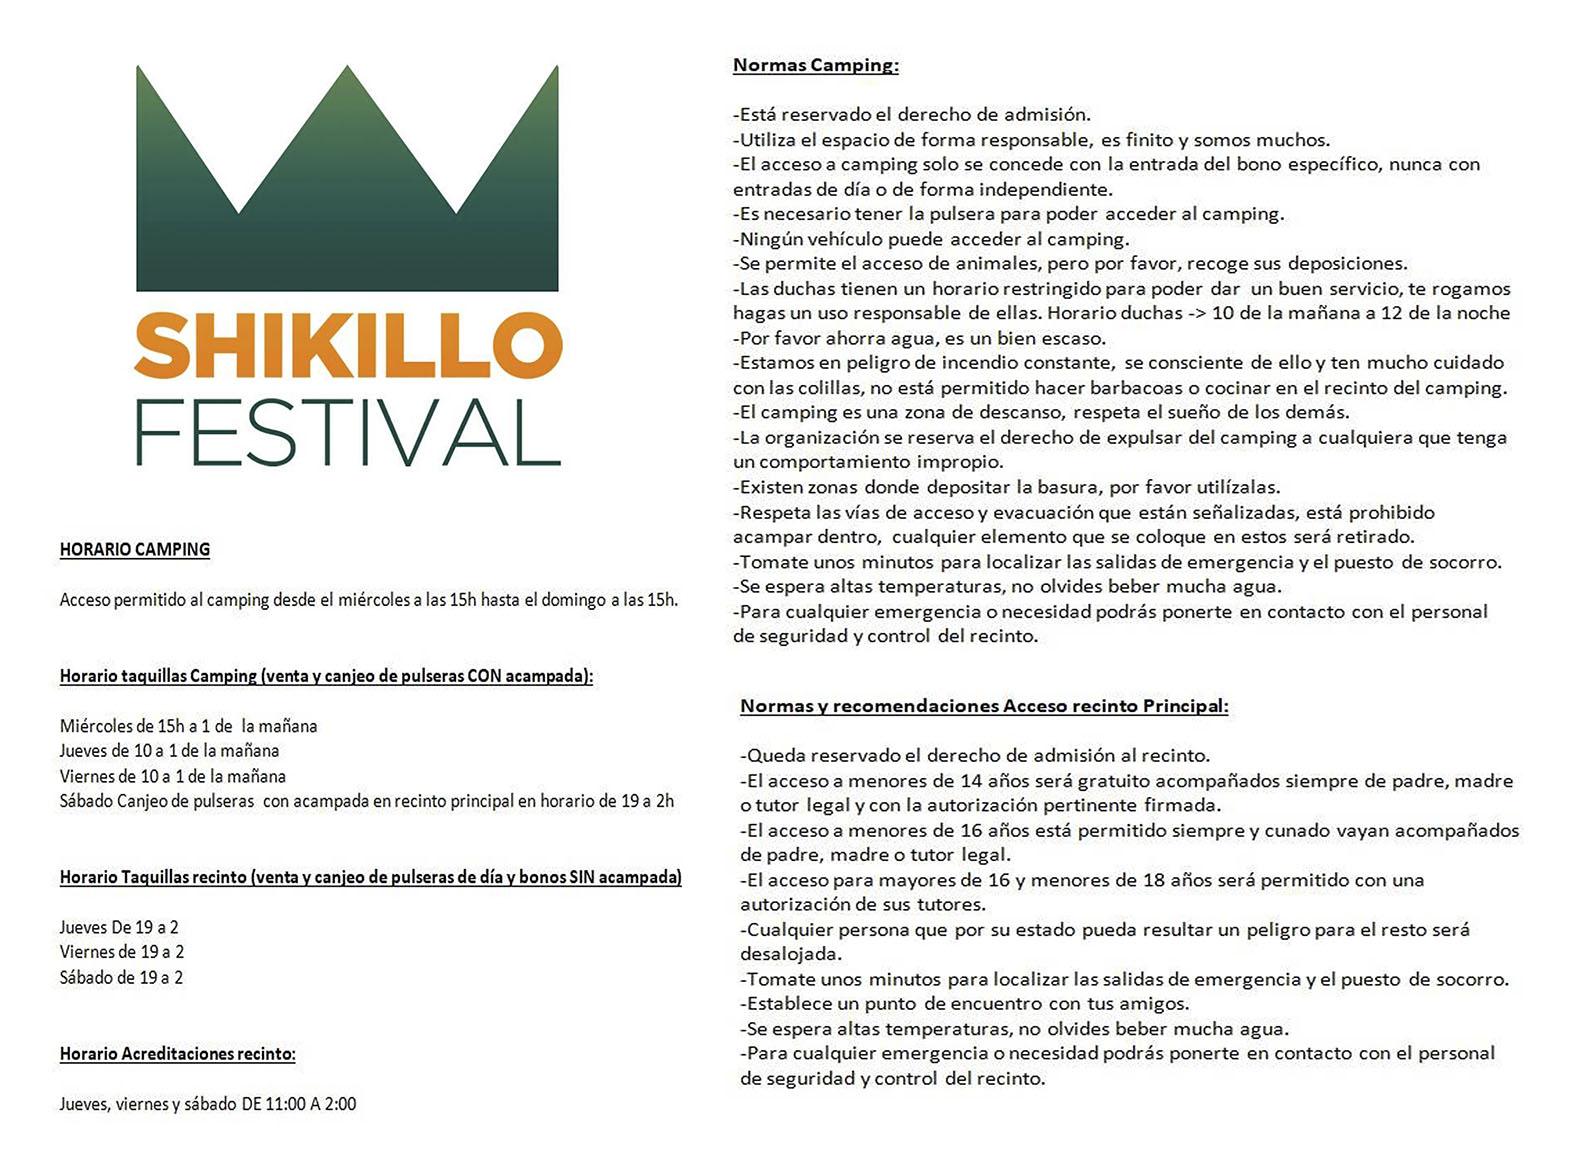 Normas Shikillo Festival 2017 - Candeleda - TiétarTeVe